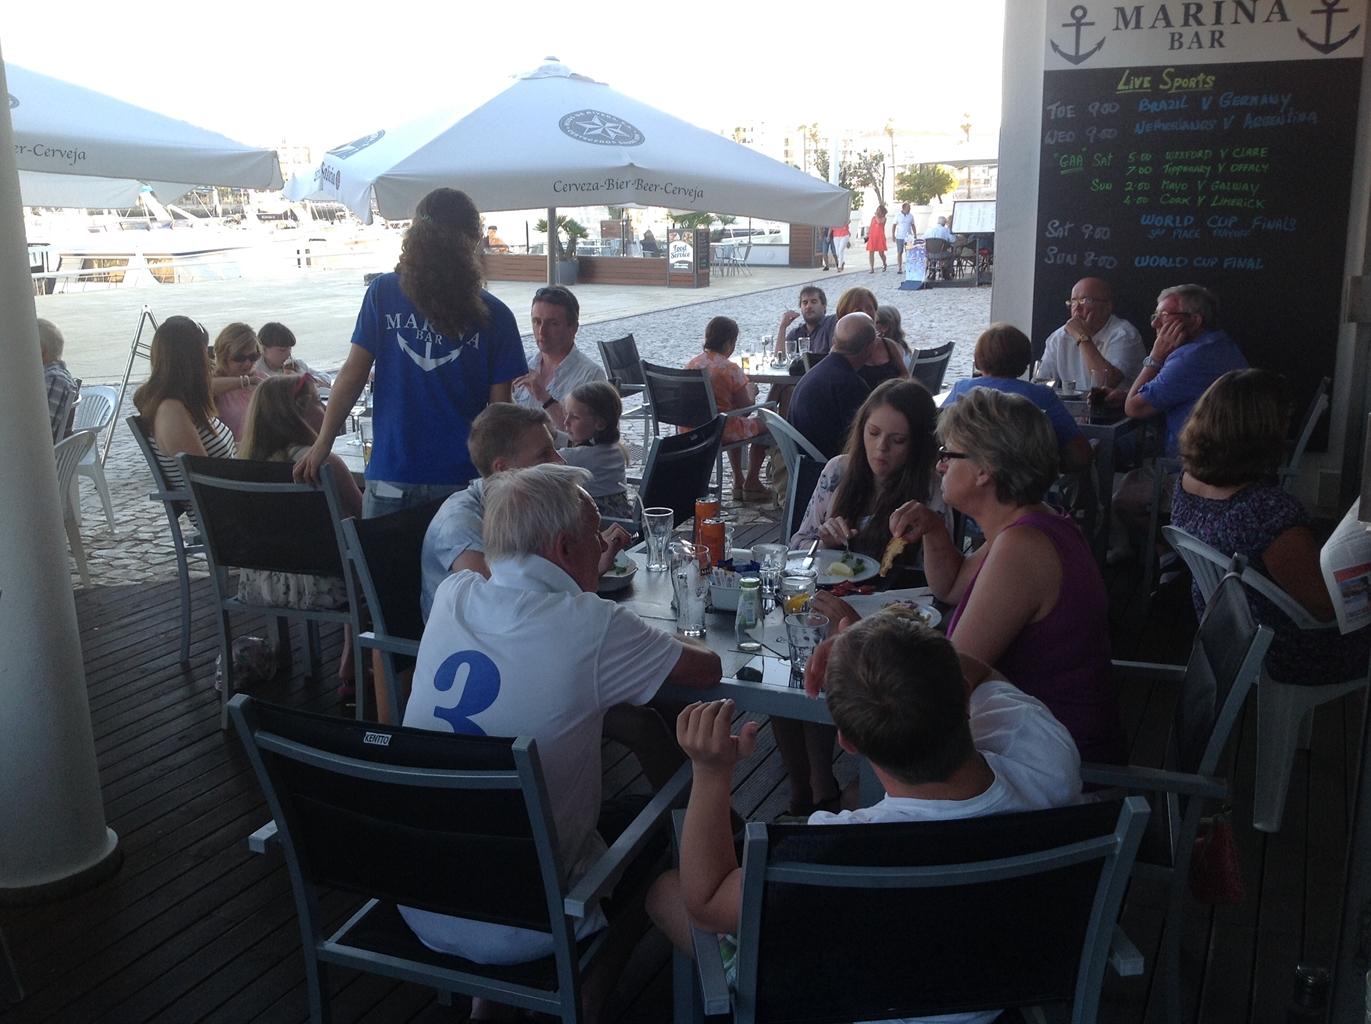 Marina Bar Lagos Friendly Bar in Lagos Portugal 14 - Sports Bar Lagos and Restaurant Bar Lagos Algarve portugal